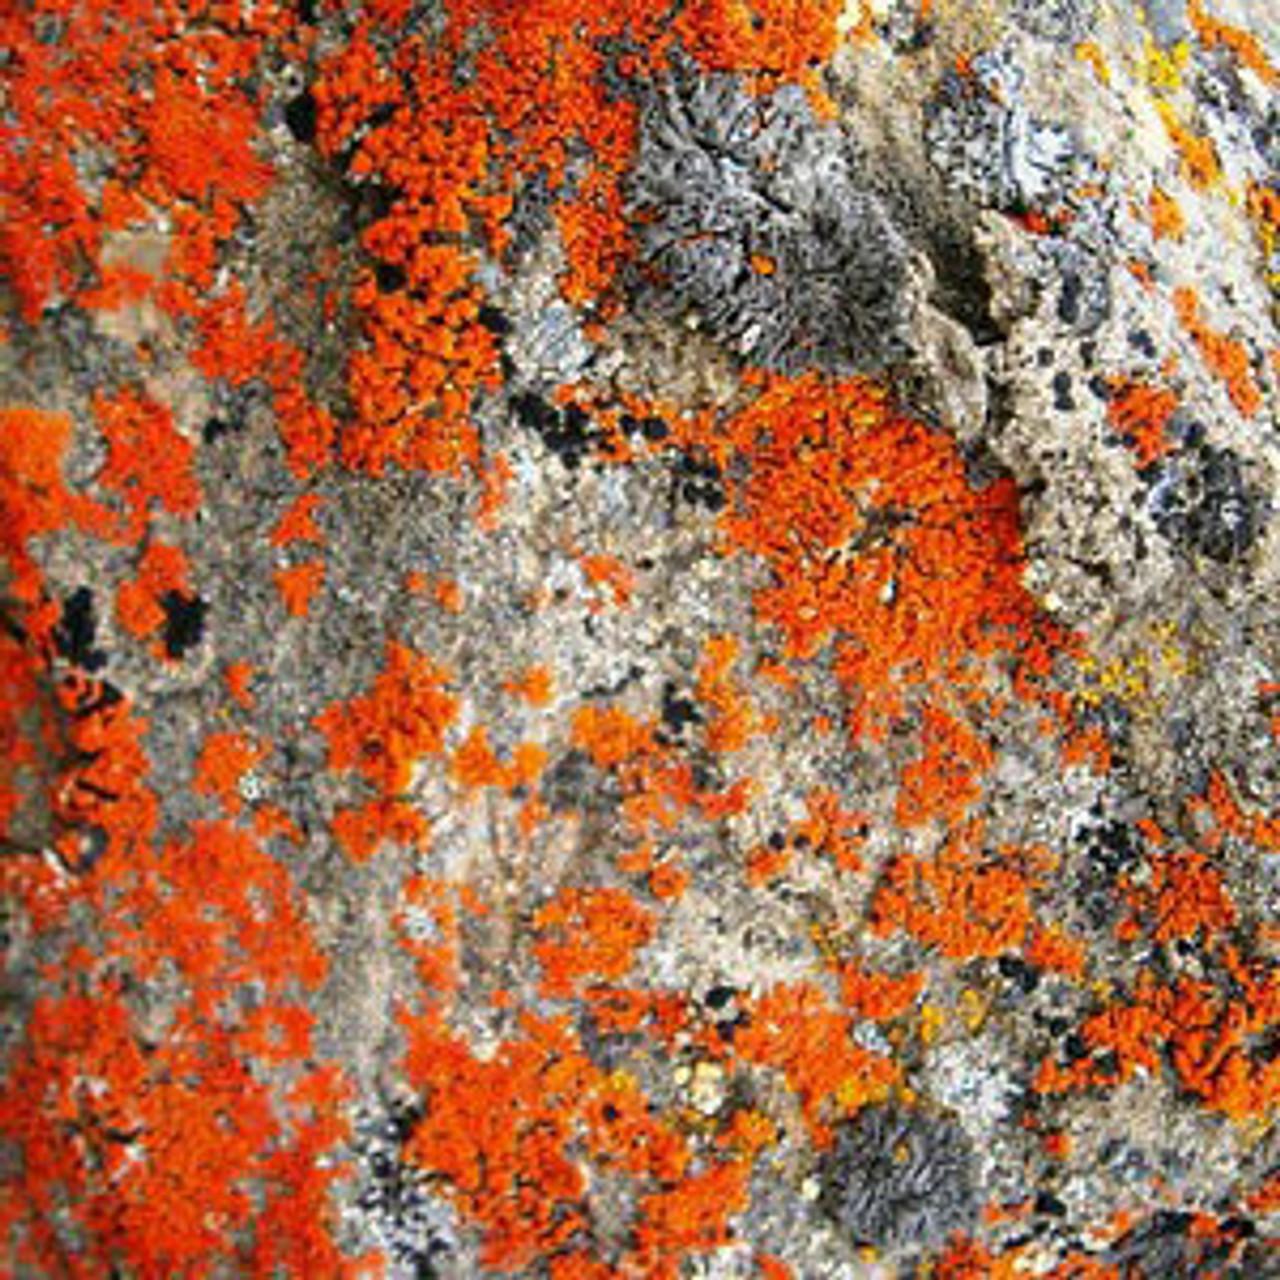 Denali's Mosses and Lichens